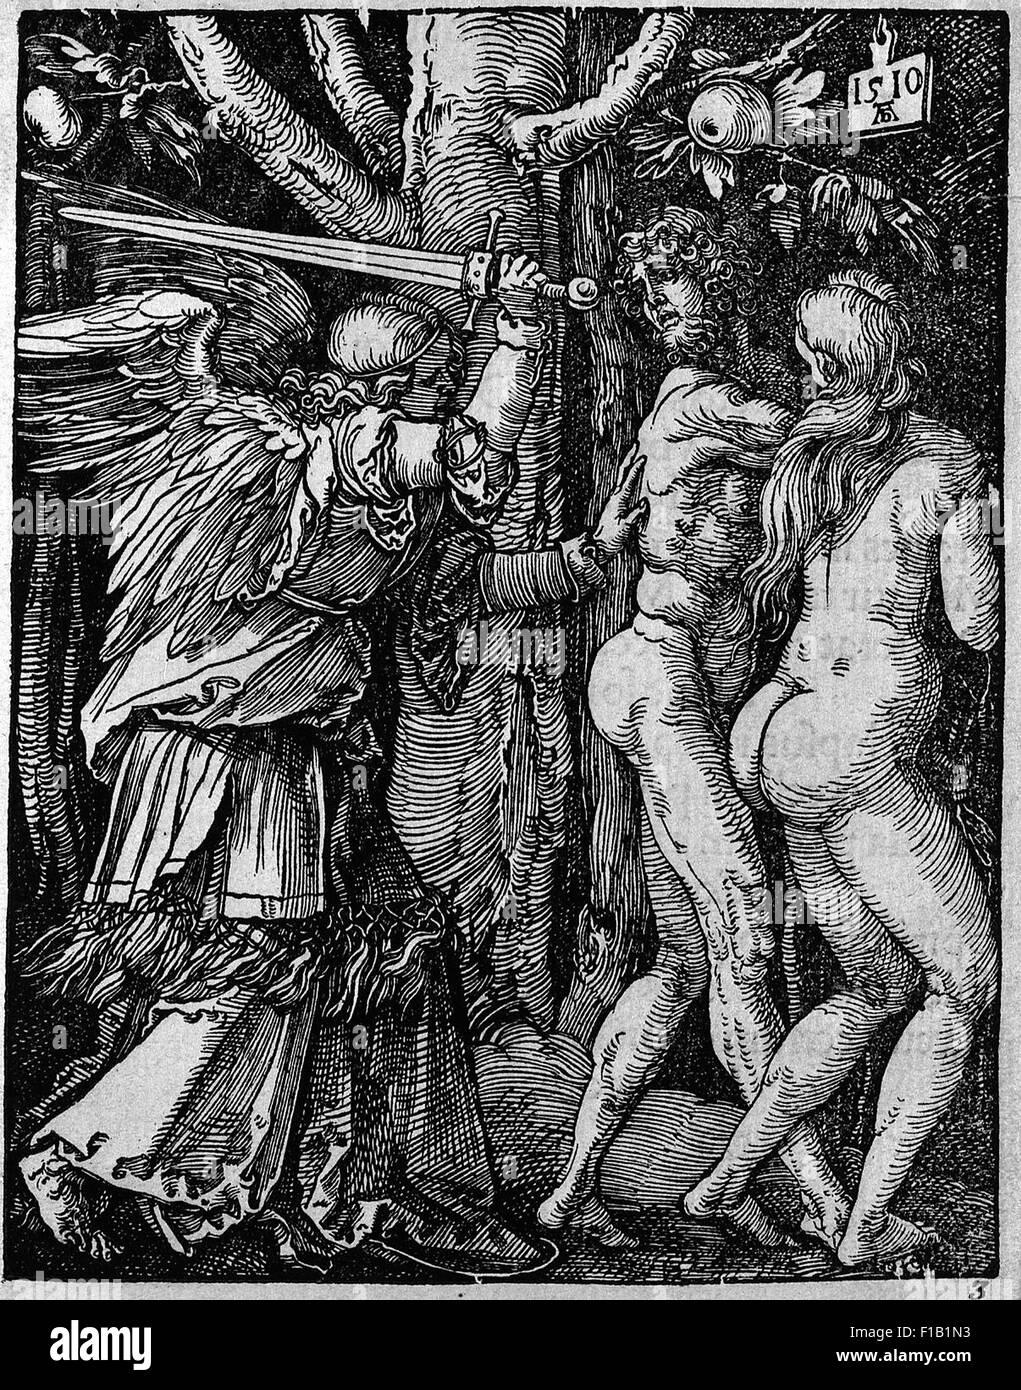 Albrecht Dürer - Expulsion from Paradise - Stock Image